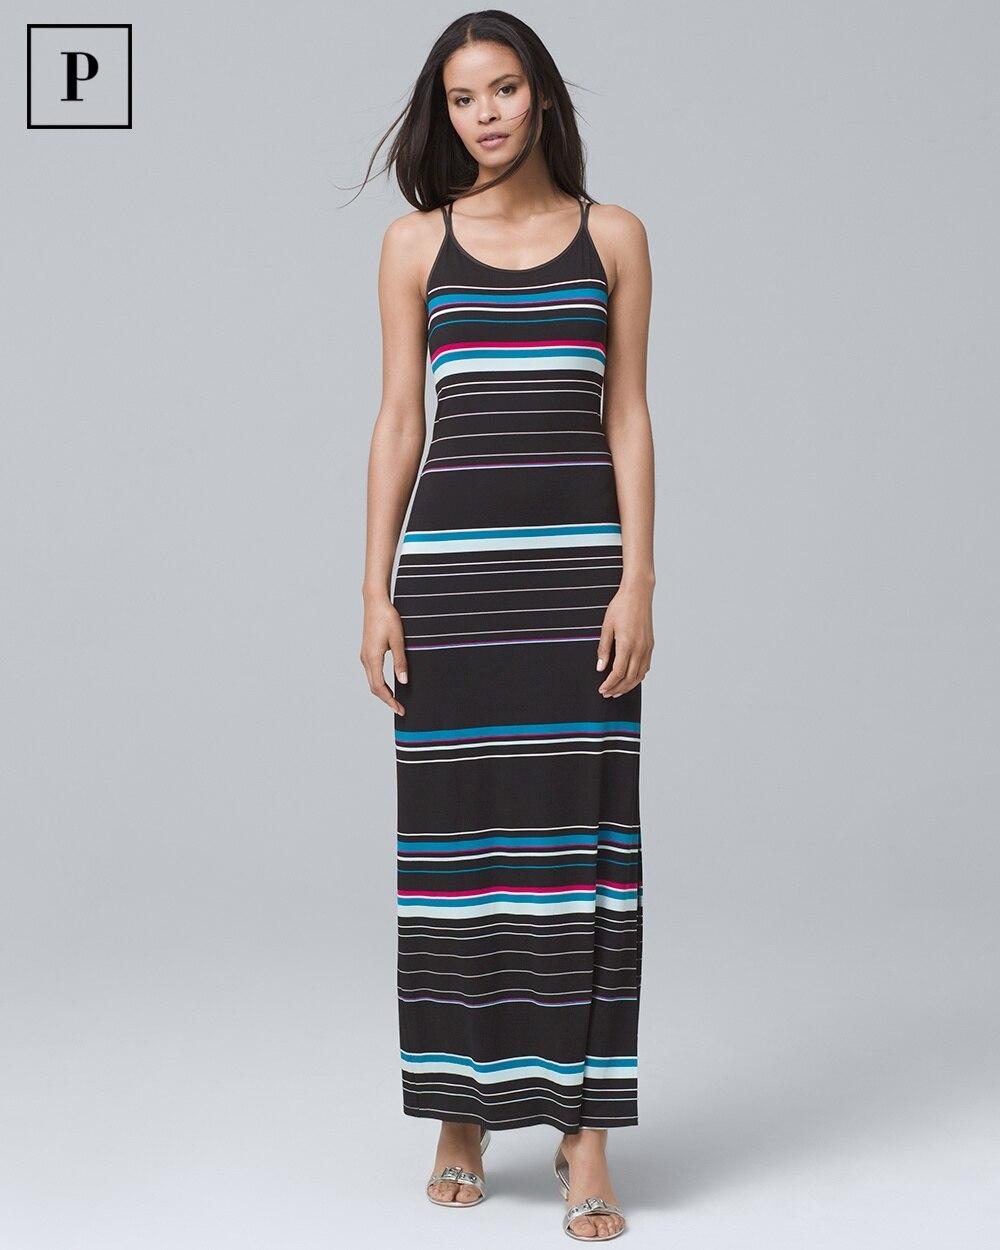 a4993223936 Petite Striped Maxi Dress - White House Black Market